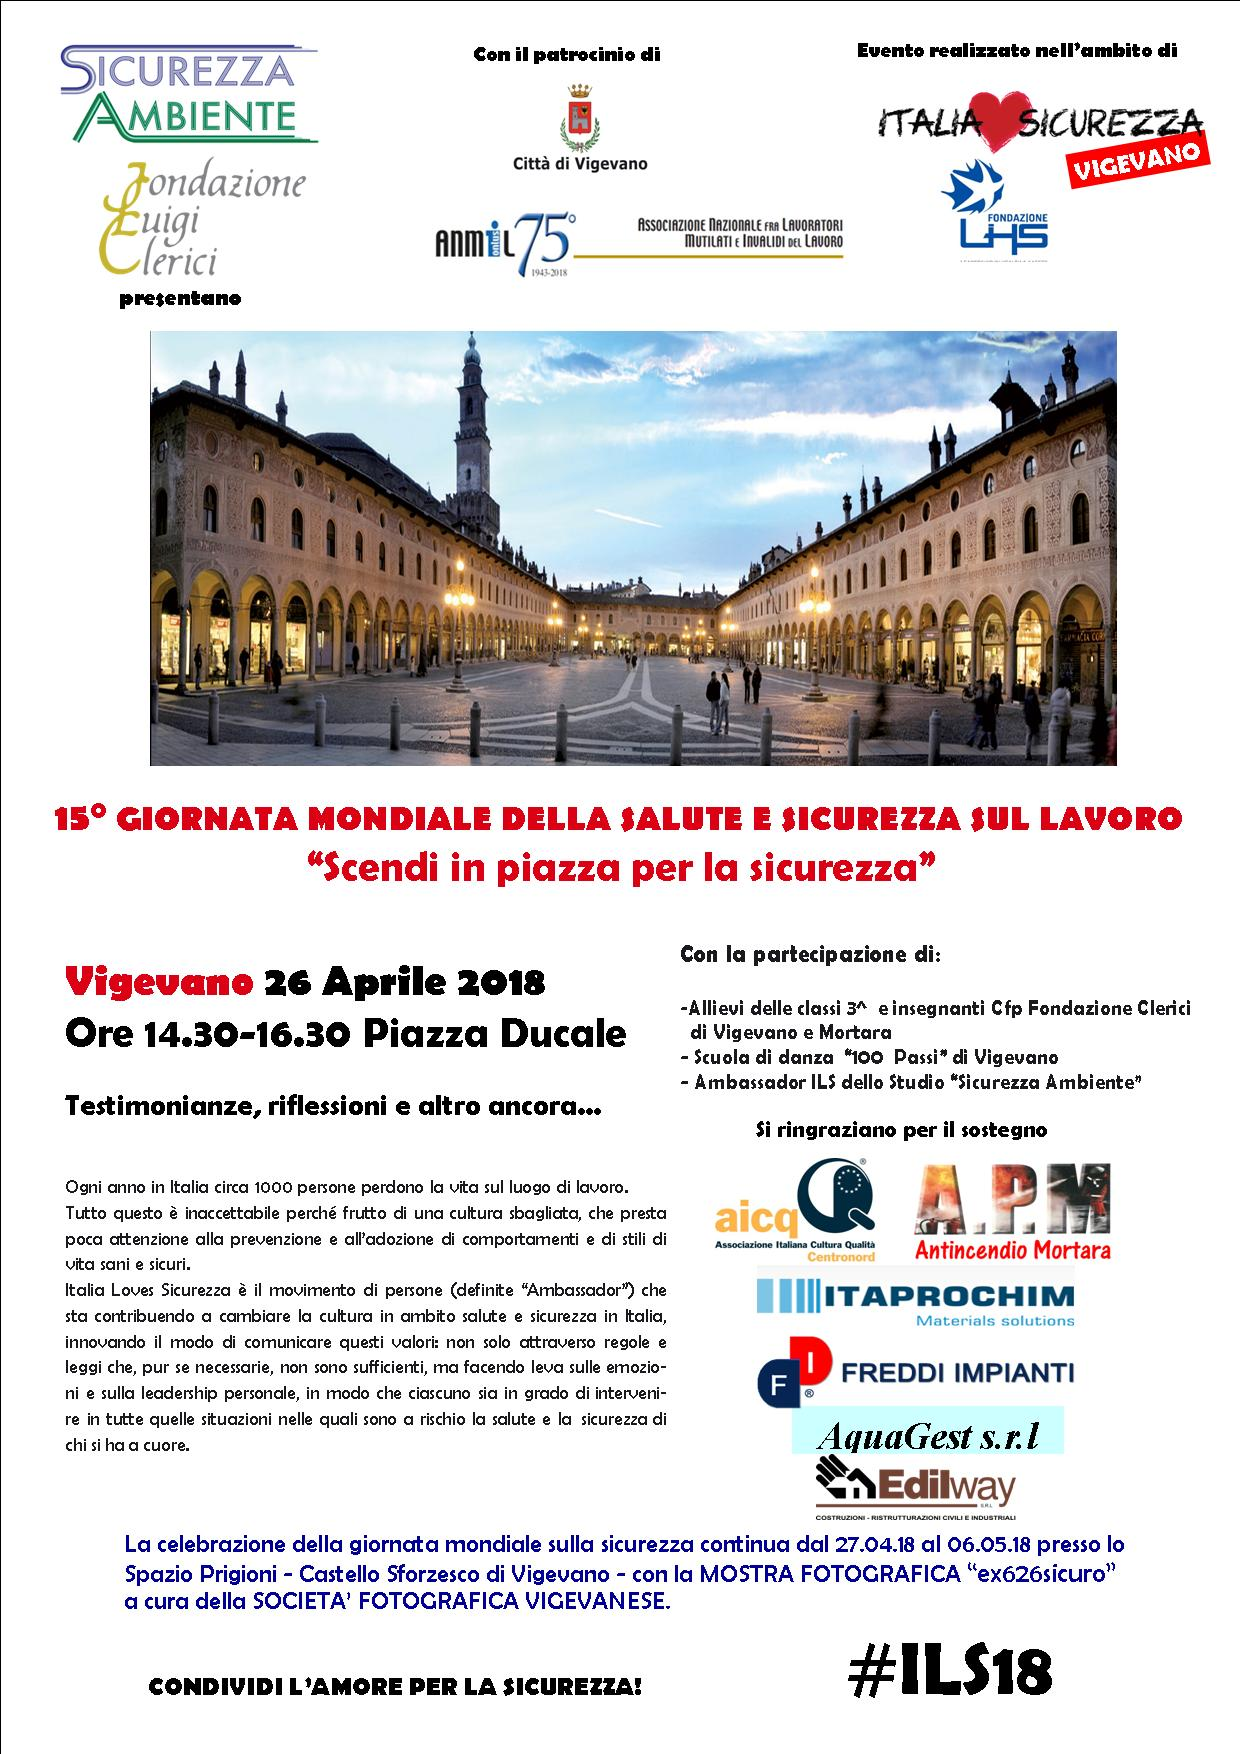 http://www.fondlhs.org/wp-content/uploads/2018/04/poster-evento-ILS-rev-03-del-130418-1.jpg